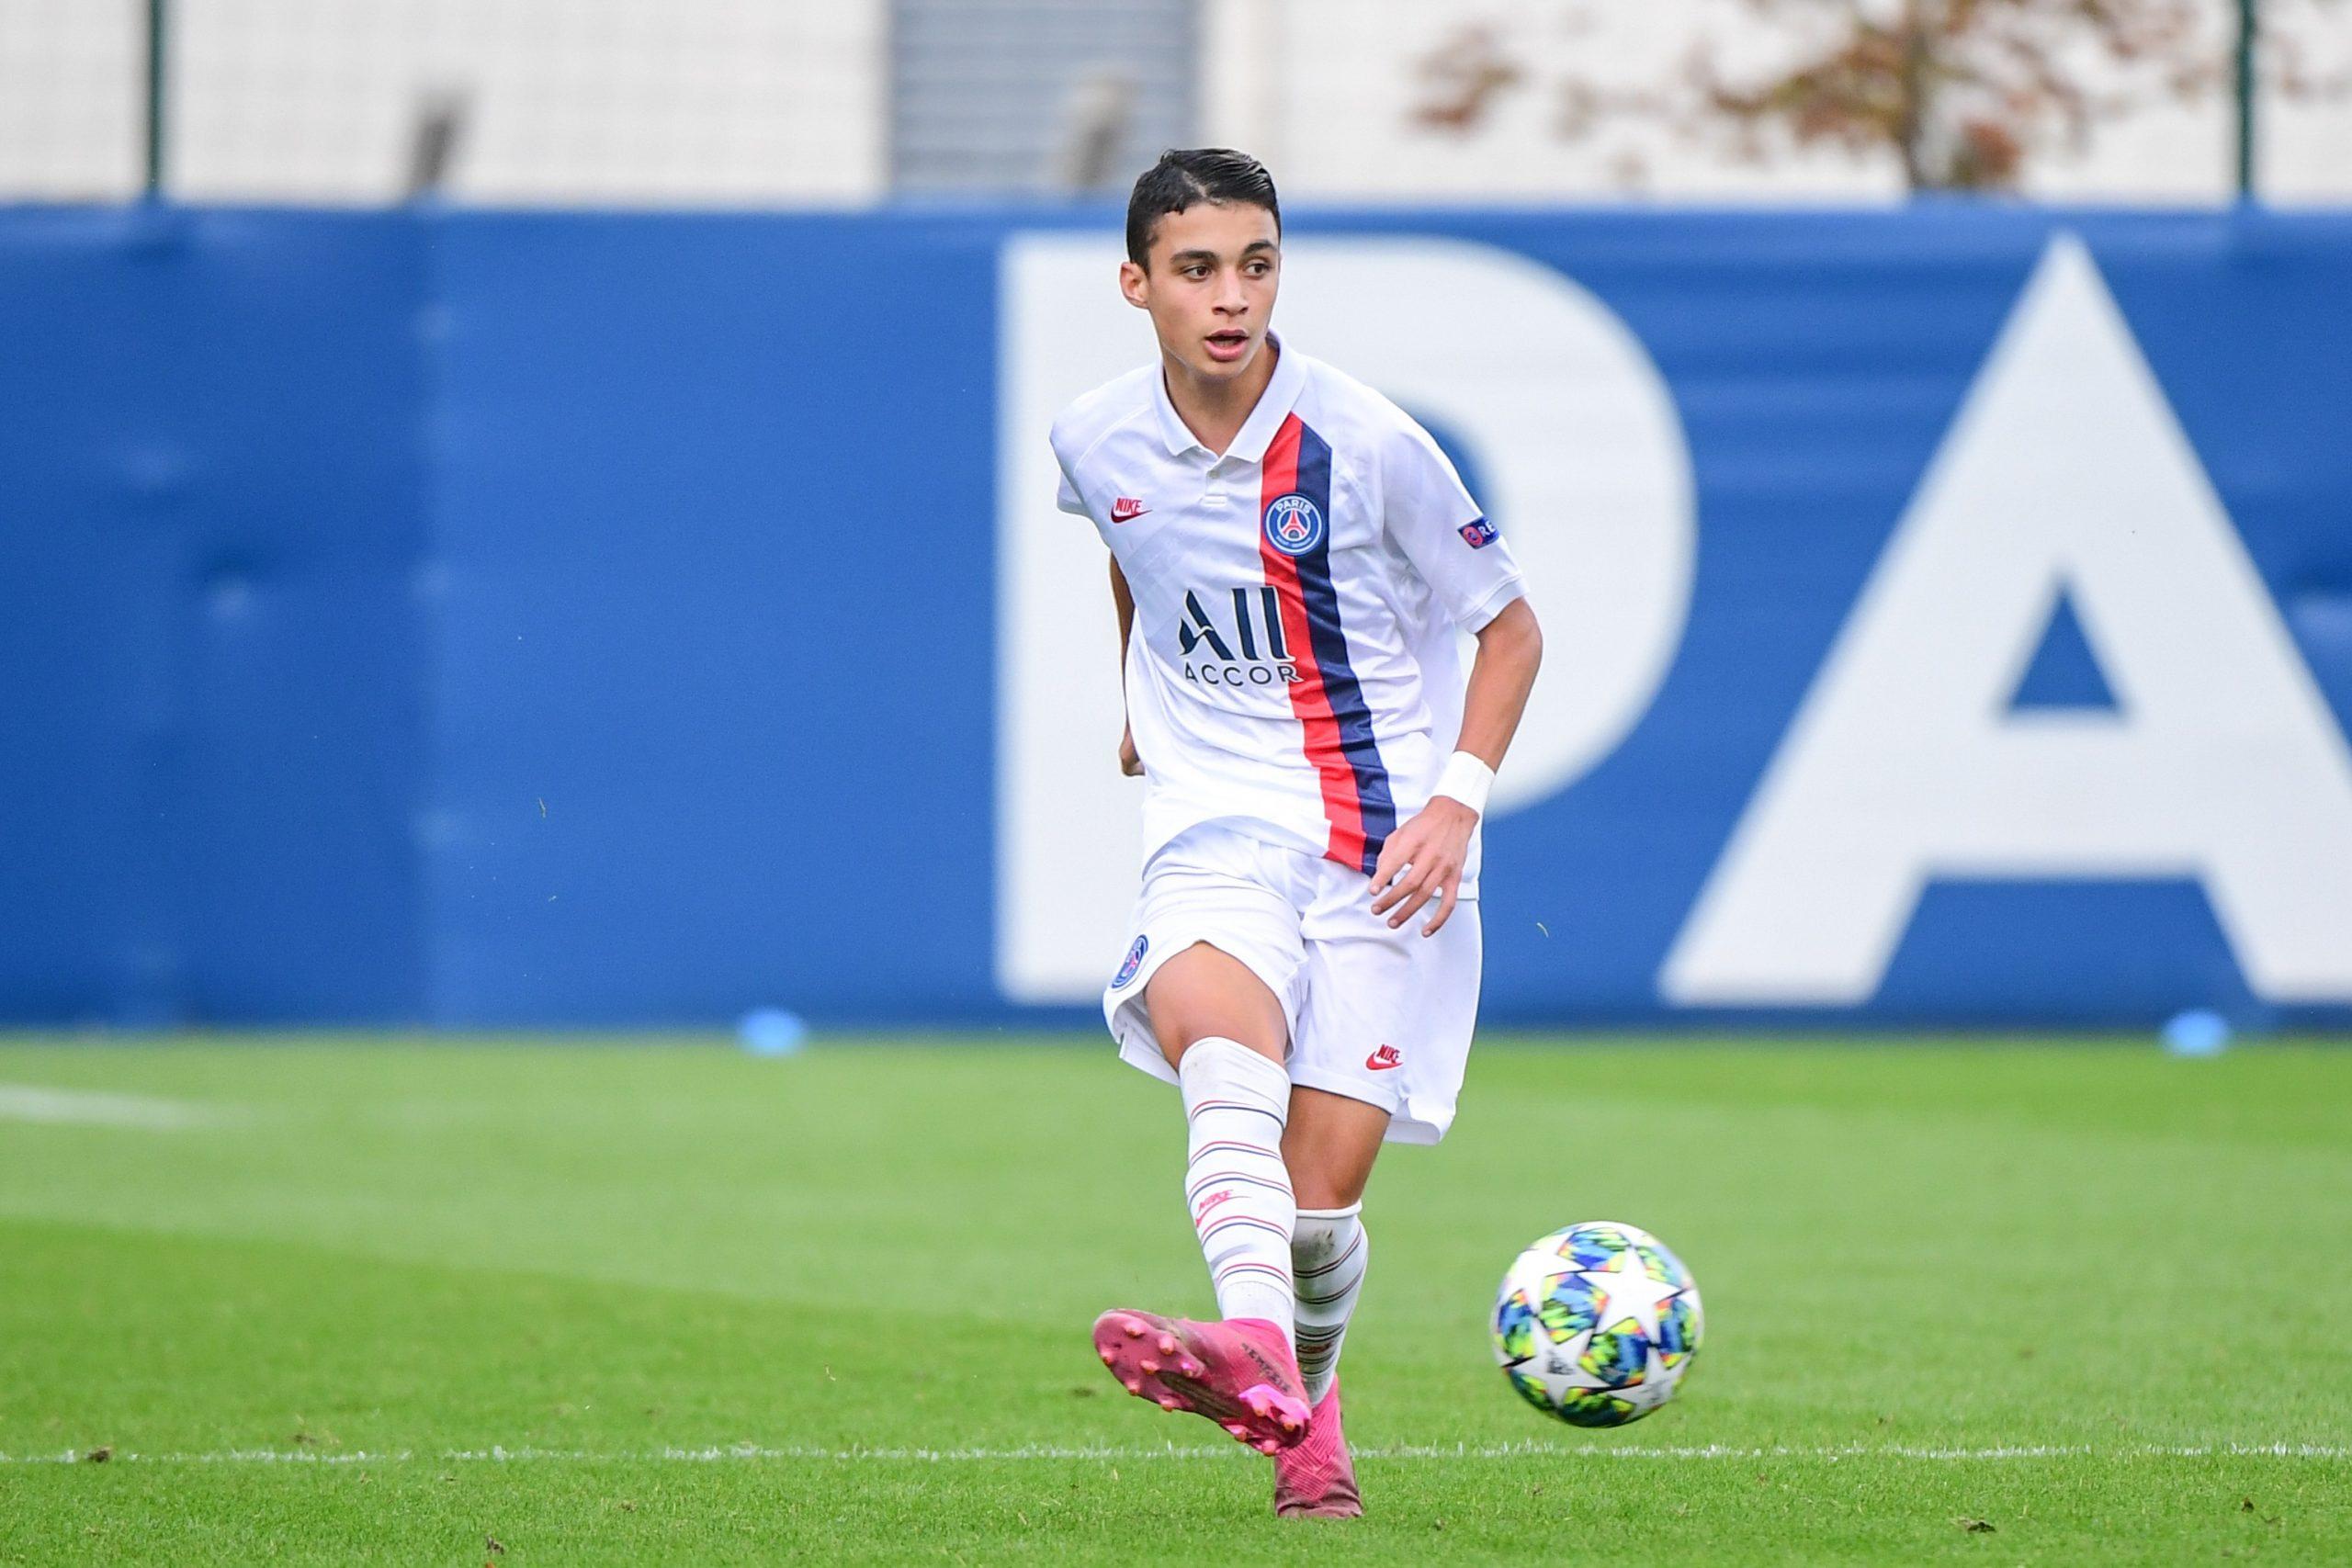 Ruiz-Atil discute avec plusieurs clubs, l'OGC Nice est favori selon L'Equipe